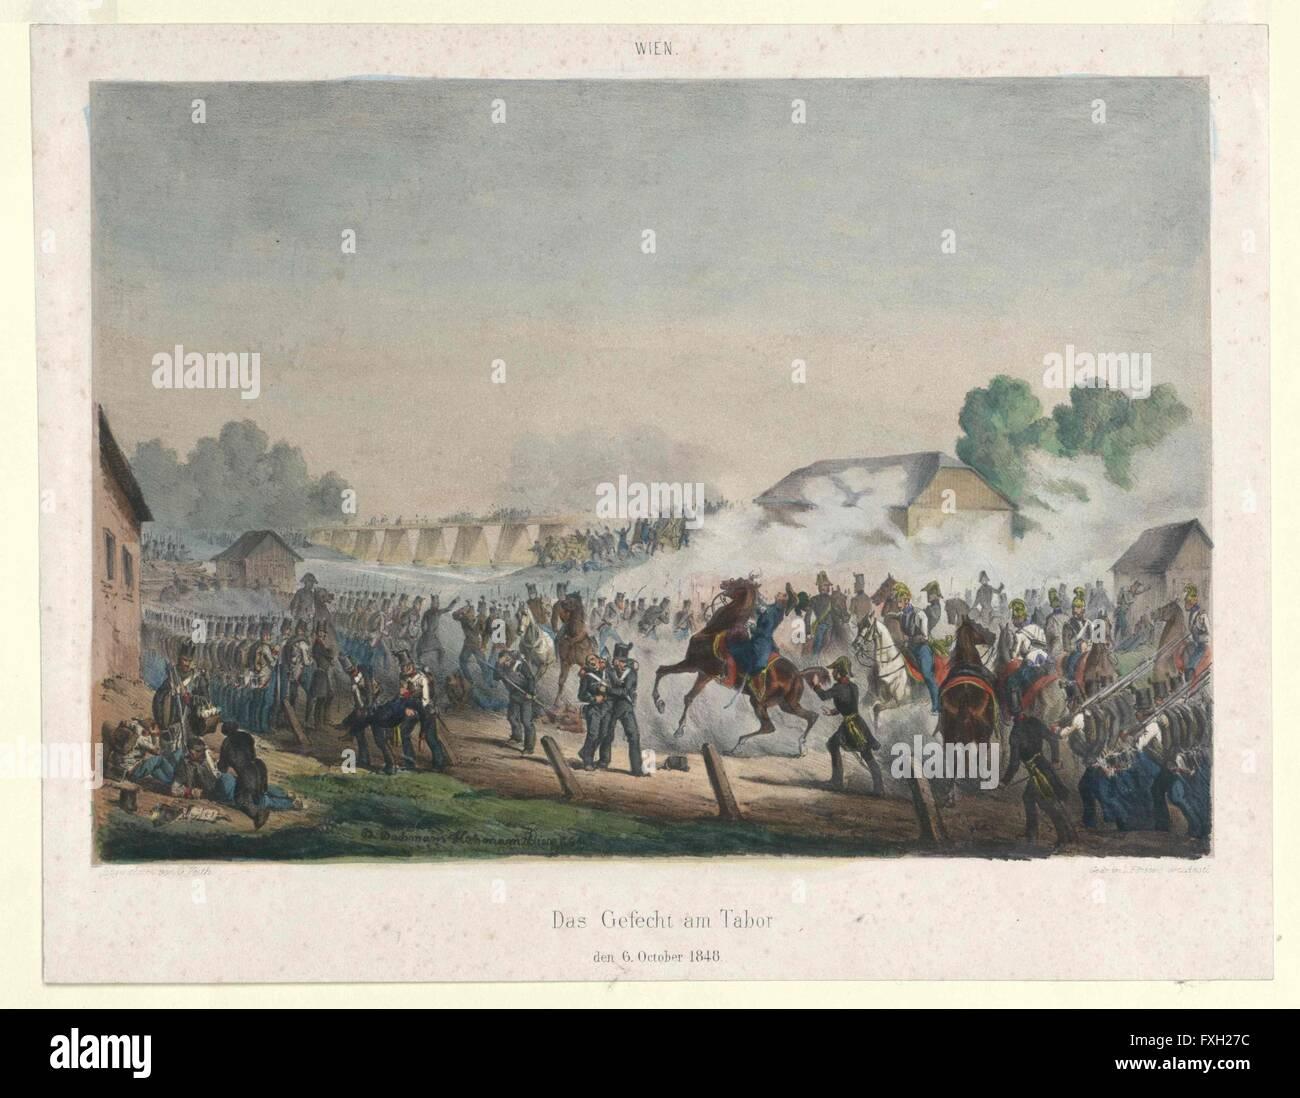 Das Gefecht am Tabor den 6. October 1848 - Stock Image